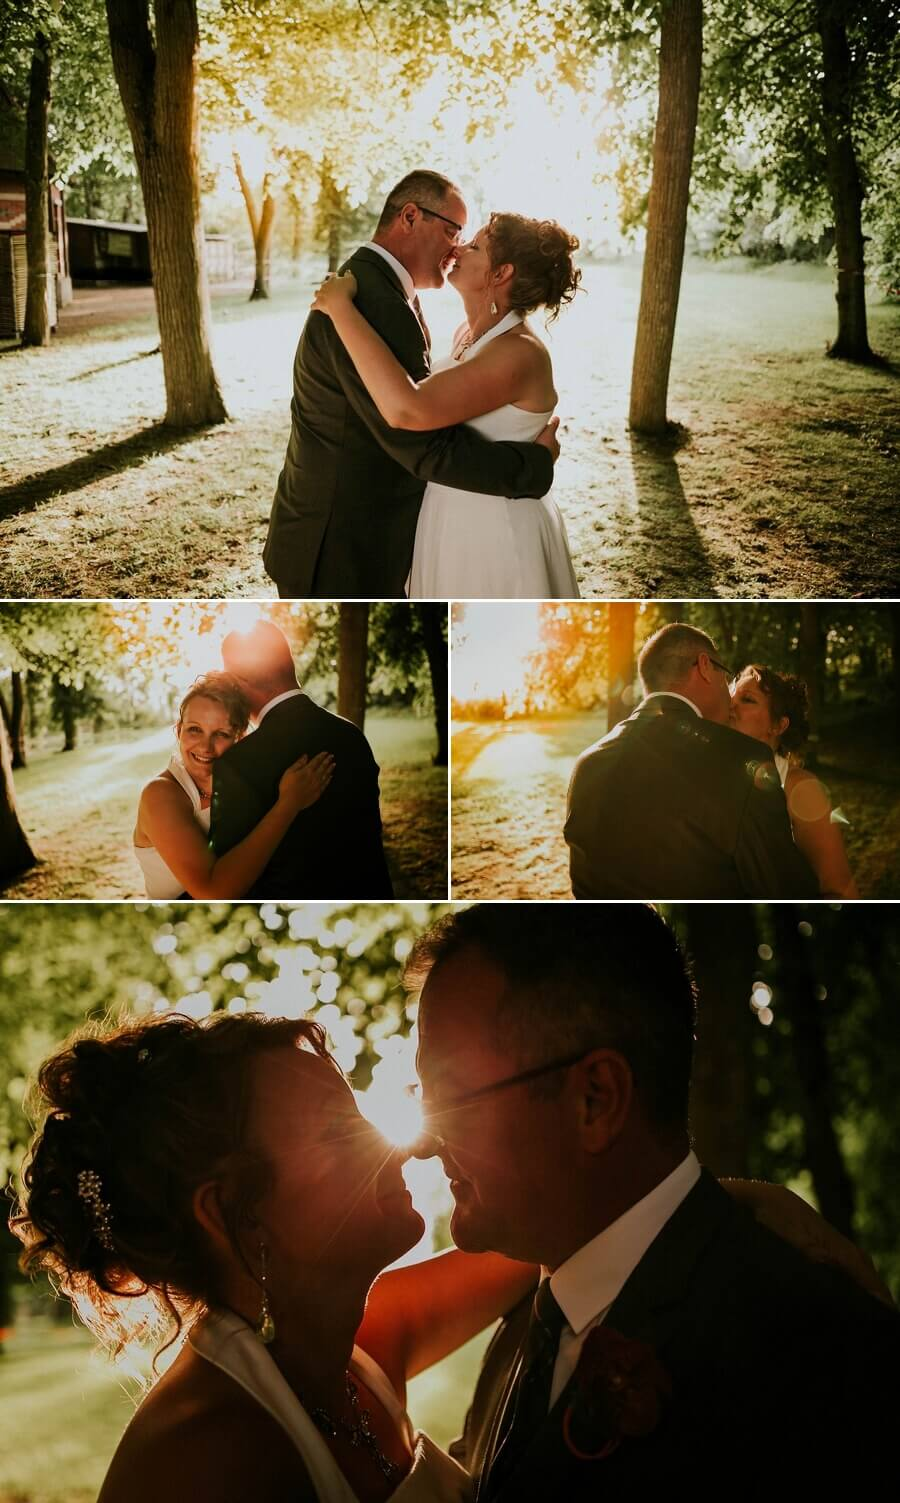 photos de mariage séance couple photographe chartres